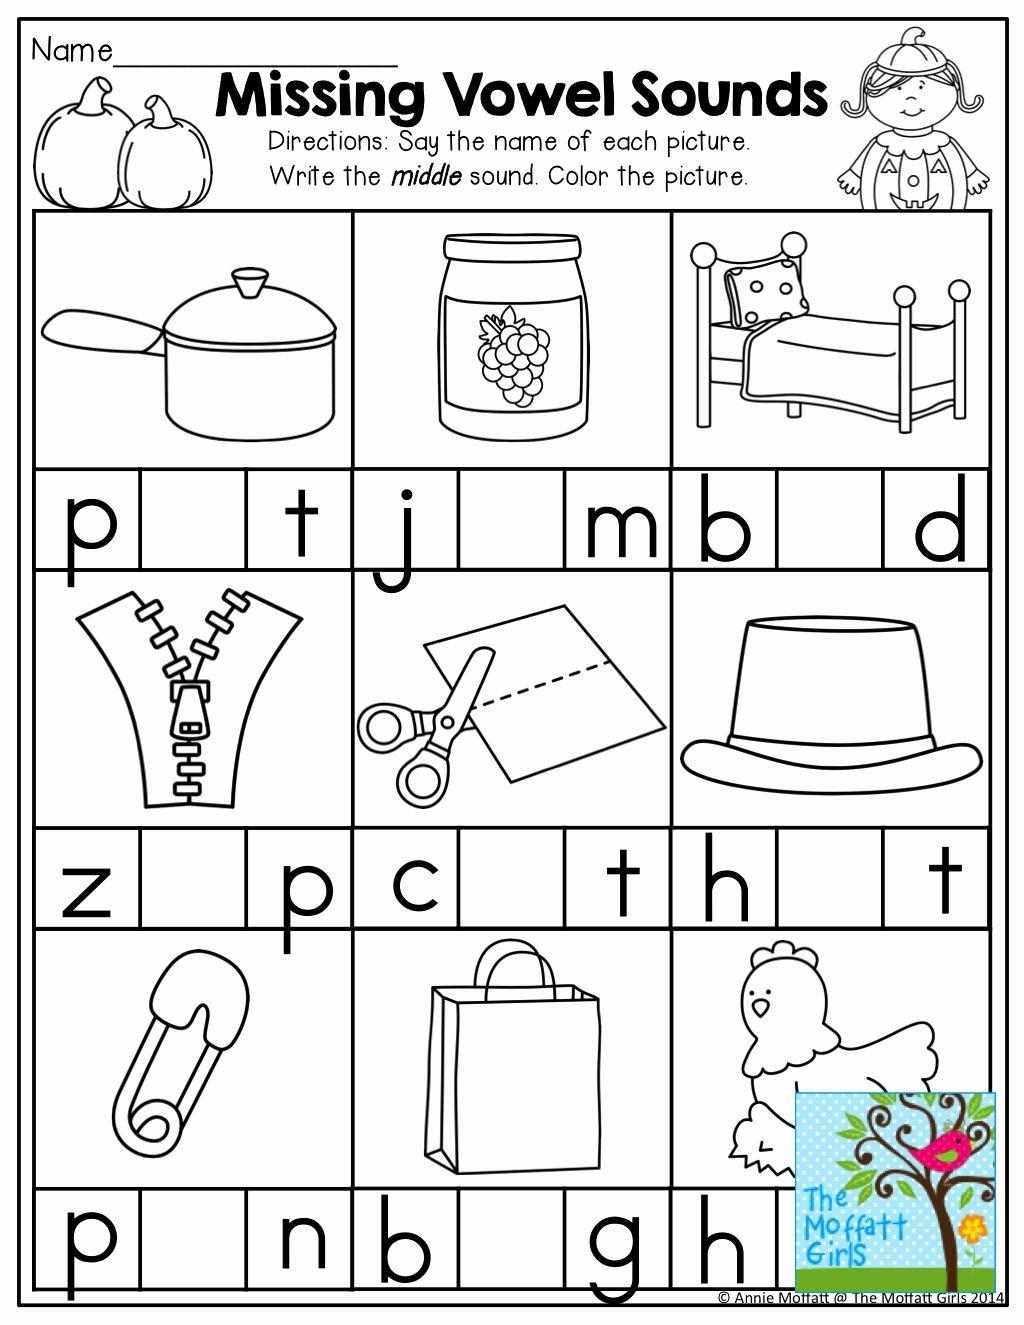 Language Arts Worksheets for Preschoolers Kids Math Worksheet Math Worksheetarten Language Arts